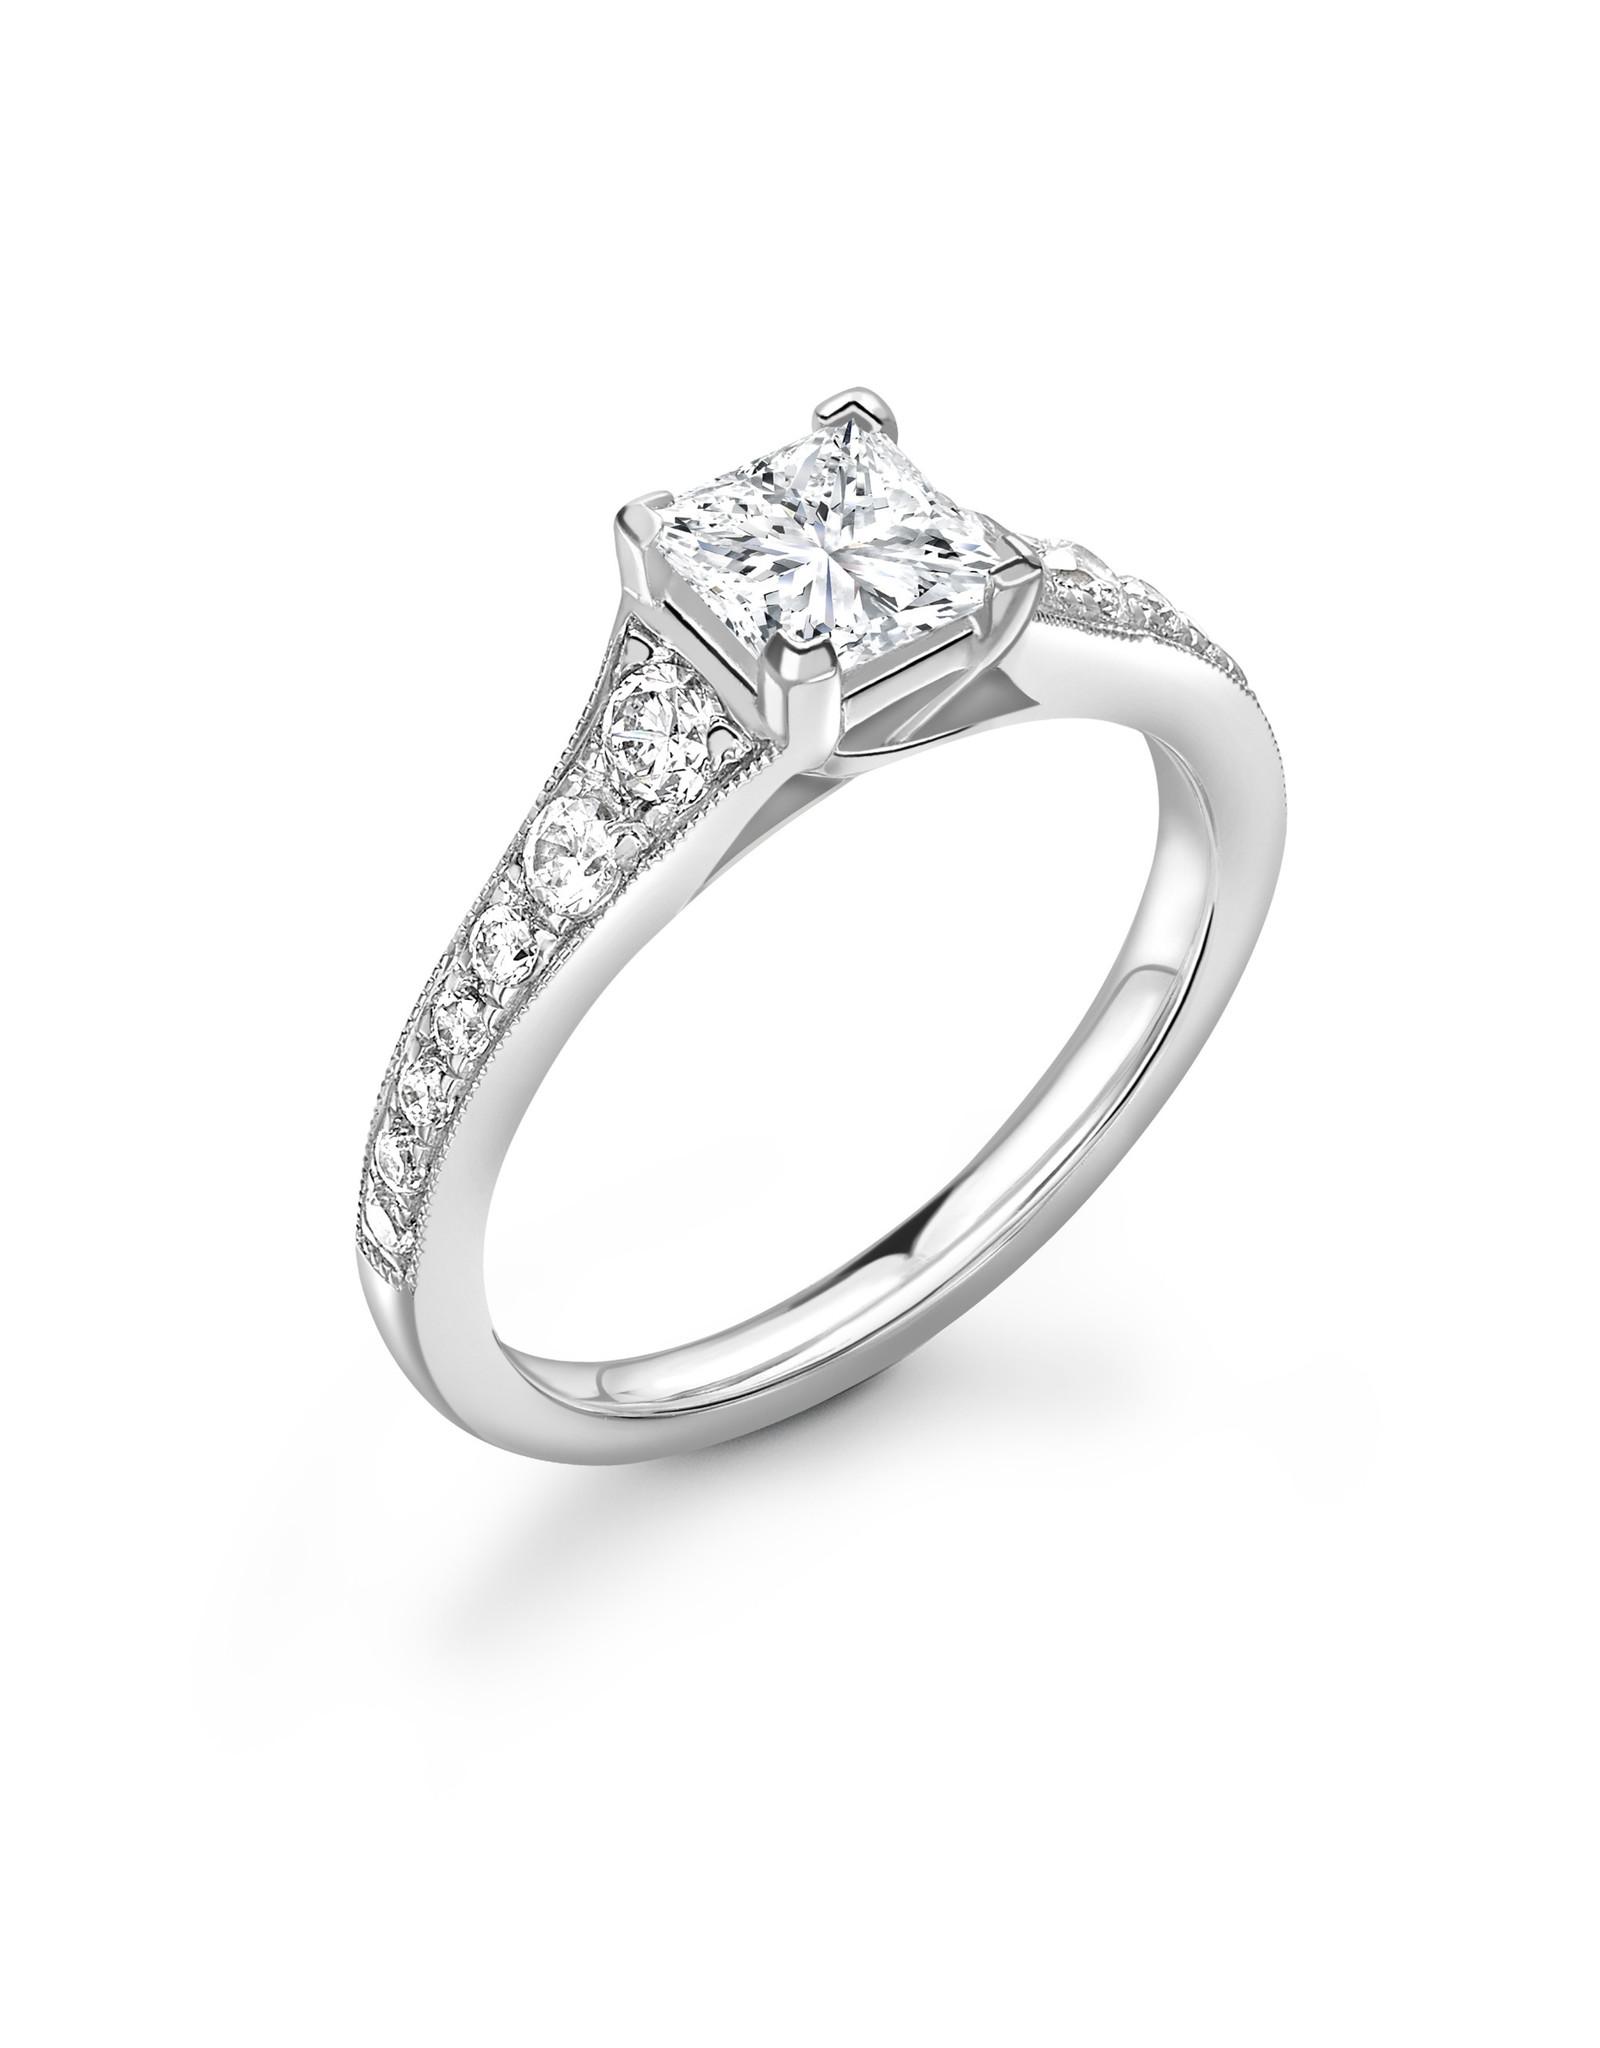 LVN Princesse Verlovingsring Met Zijsteentjes LVNRX6576